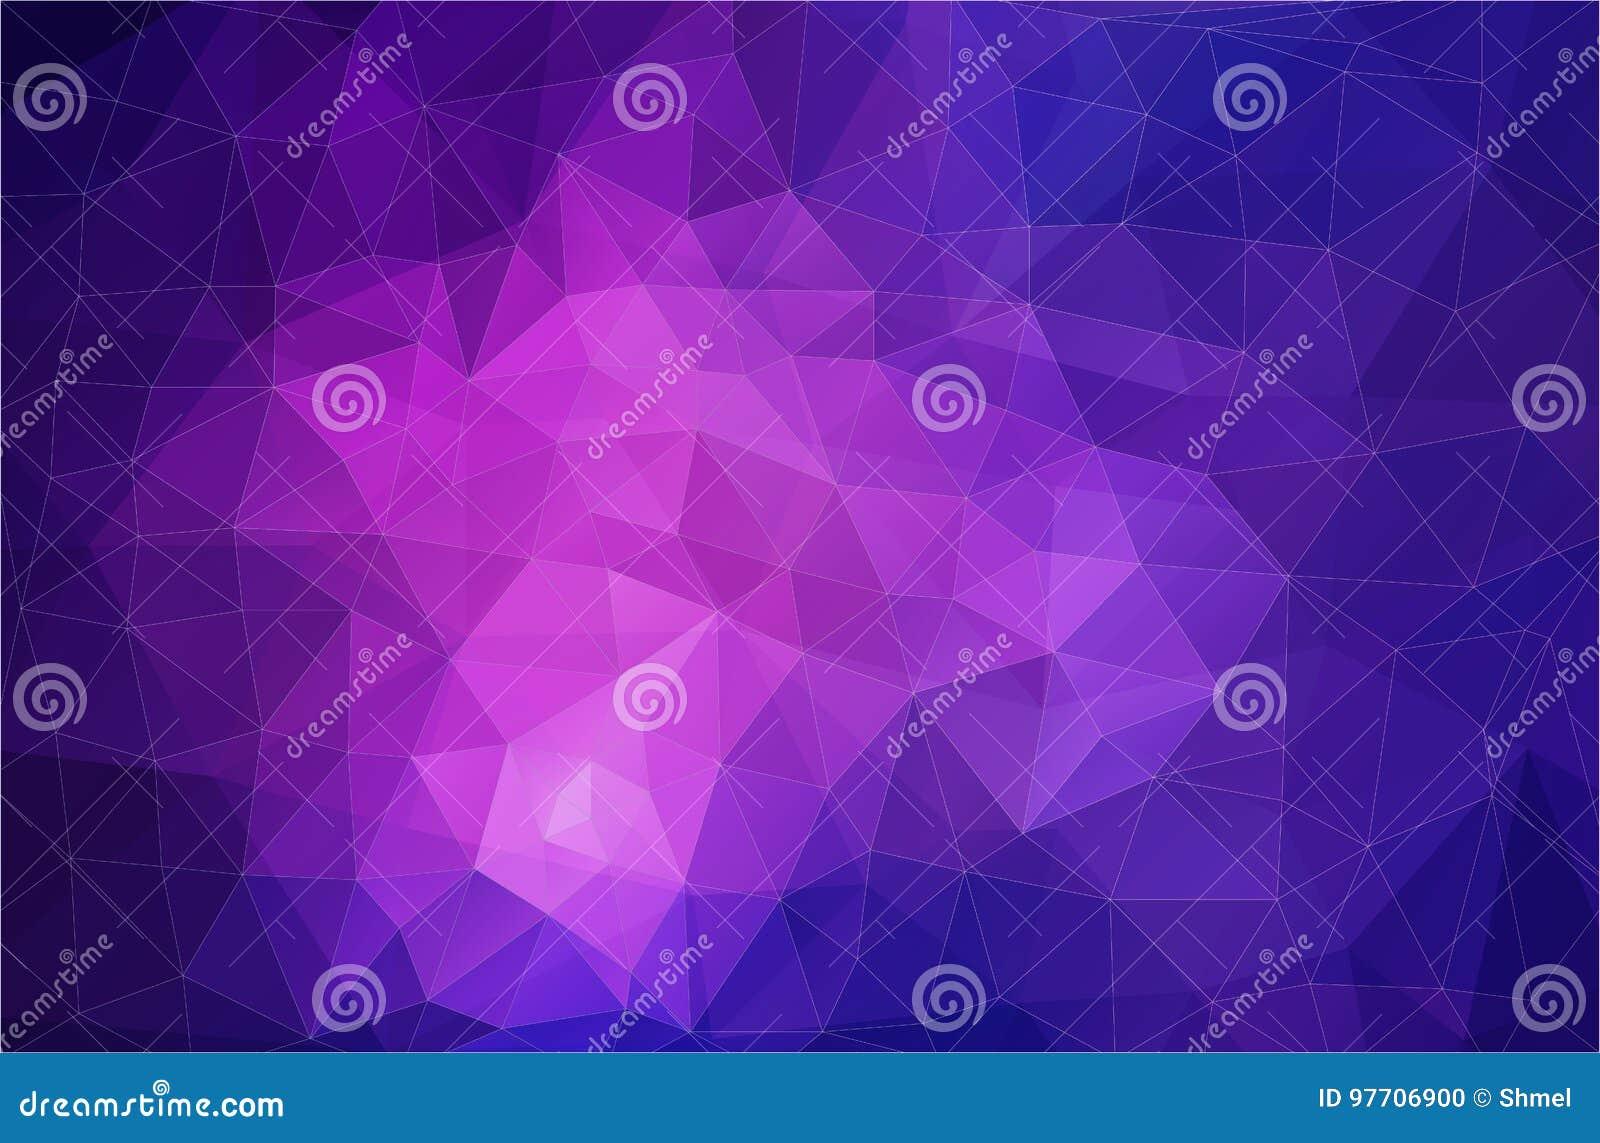 Flat Violet Triangle Geometric Wallpaper